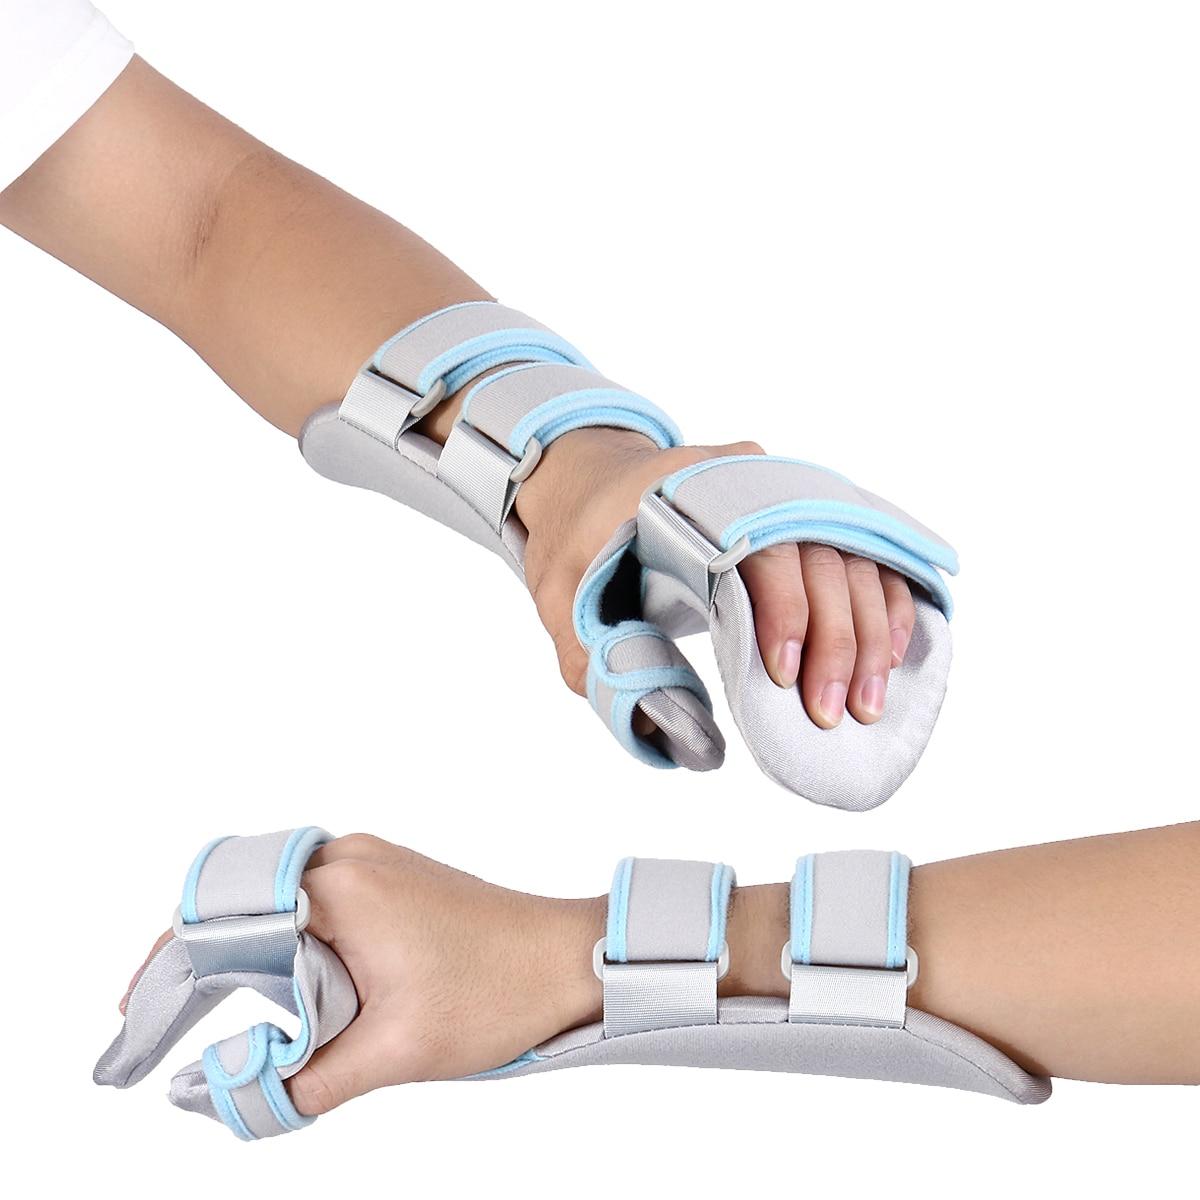 купить Adjustable Wrist Fracture Fixation Board Braces Hand Wrist Support Splint Ligament Injury Arm Protection Strap Breathable Braces по цене 1134.2 рублей